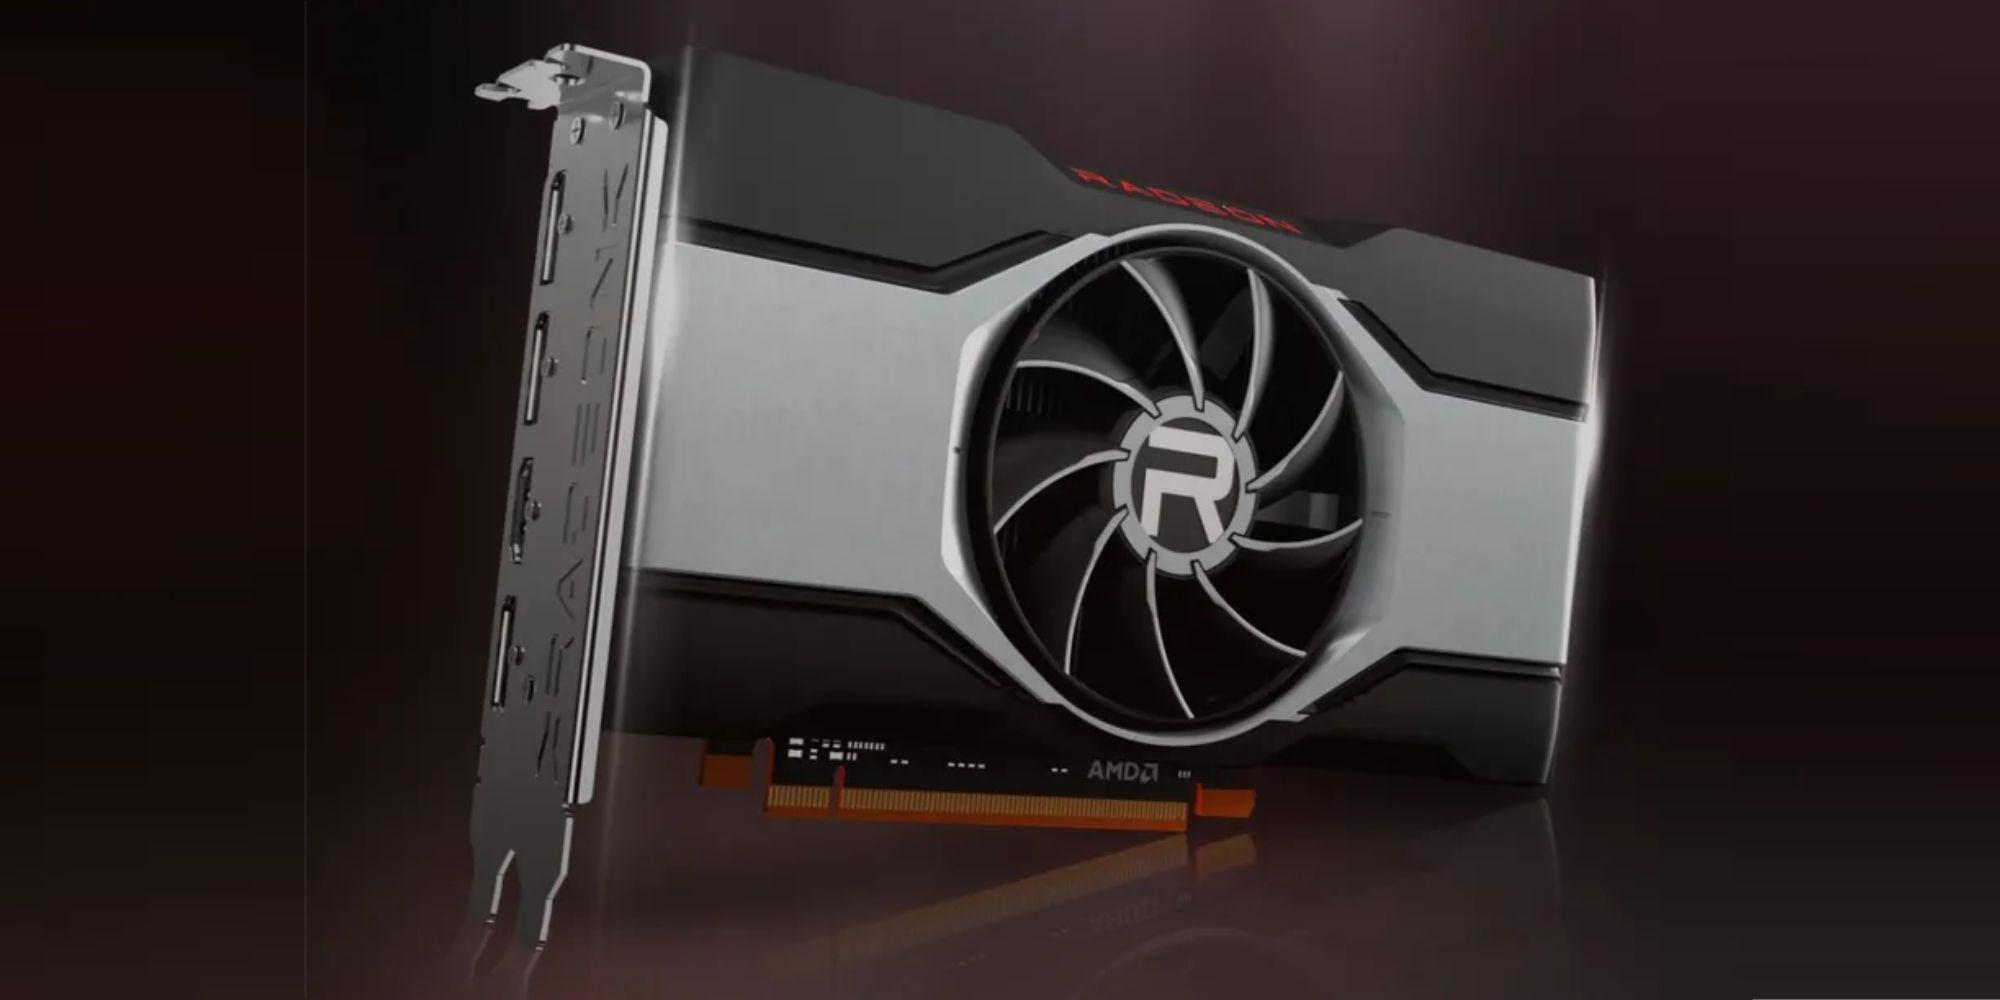 Radeon RX 6600 Vs. RX 6600 XT: Best AMD Budget Card To Buy